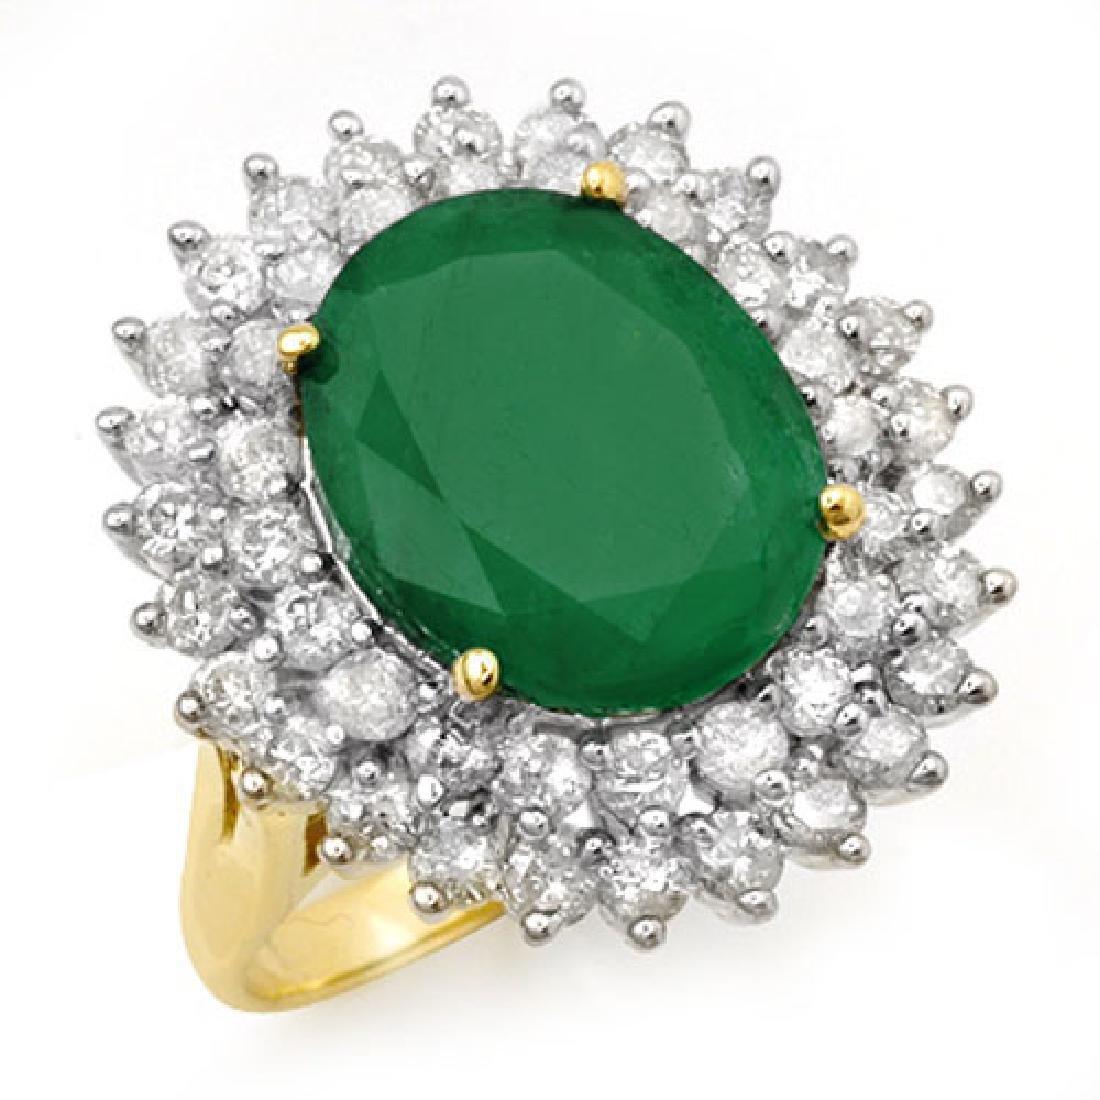 10.83 CTW Emerald & Diamond Ring 14K Yellow Gold